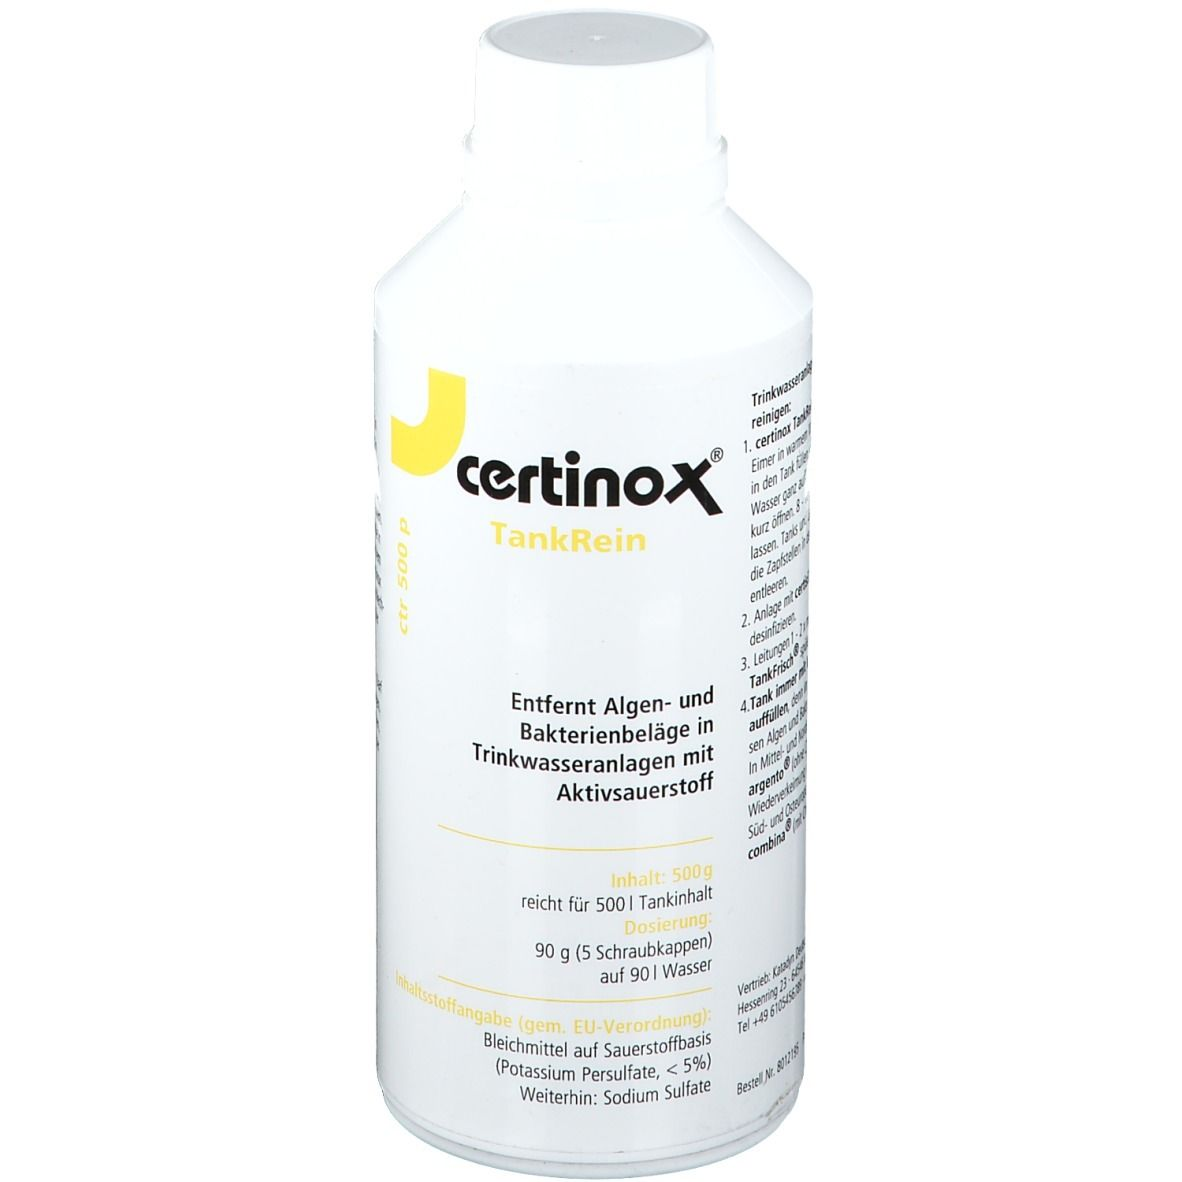 certinox® TankRein